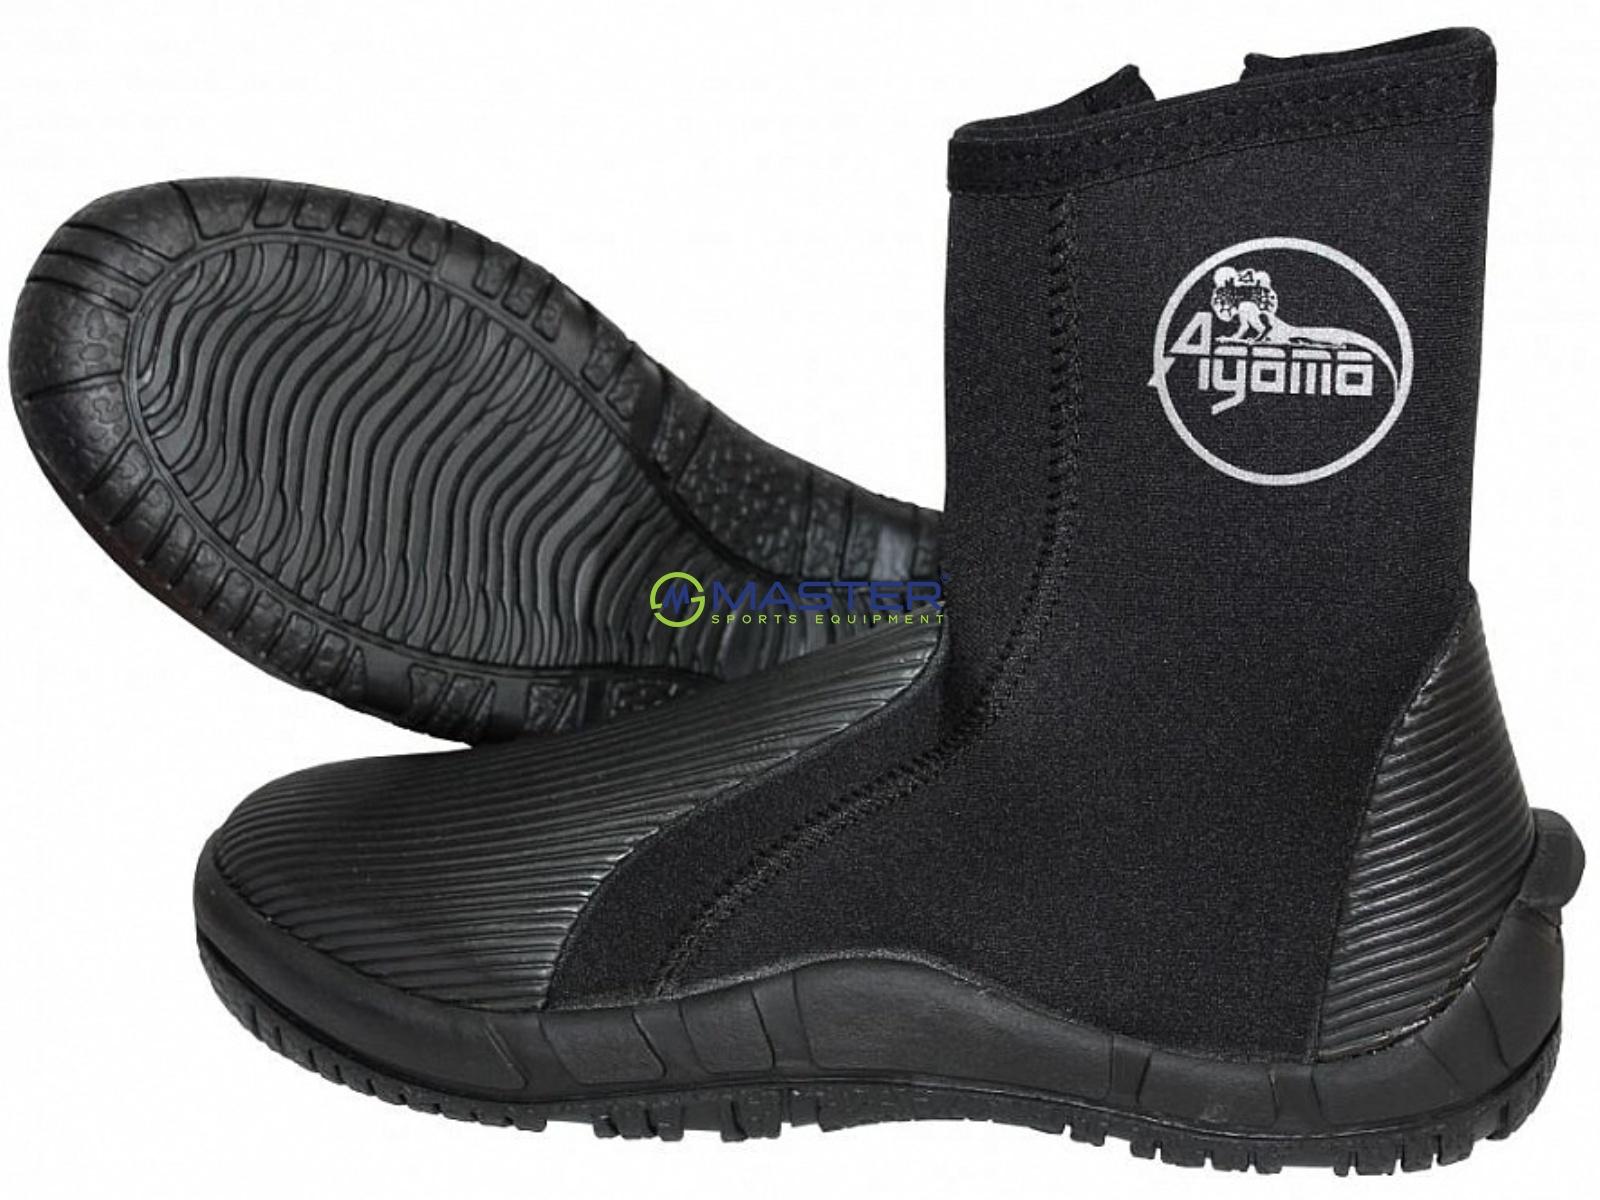 Neoprenové boty AGAMA Warcraft 5 mm - vel. 39  b2b5c57c67f